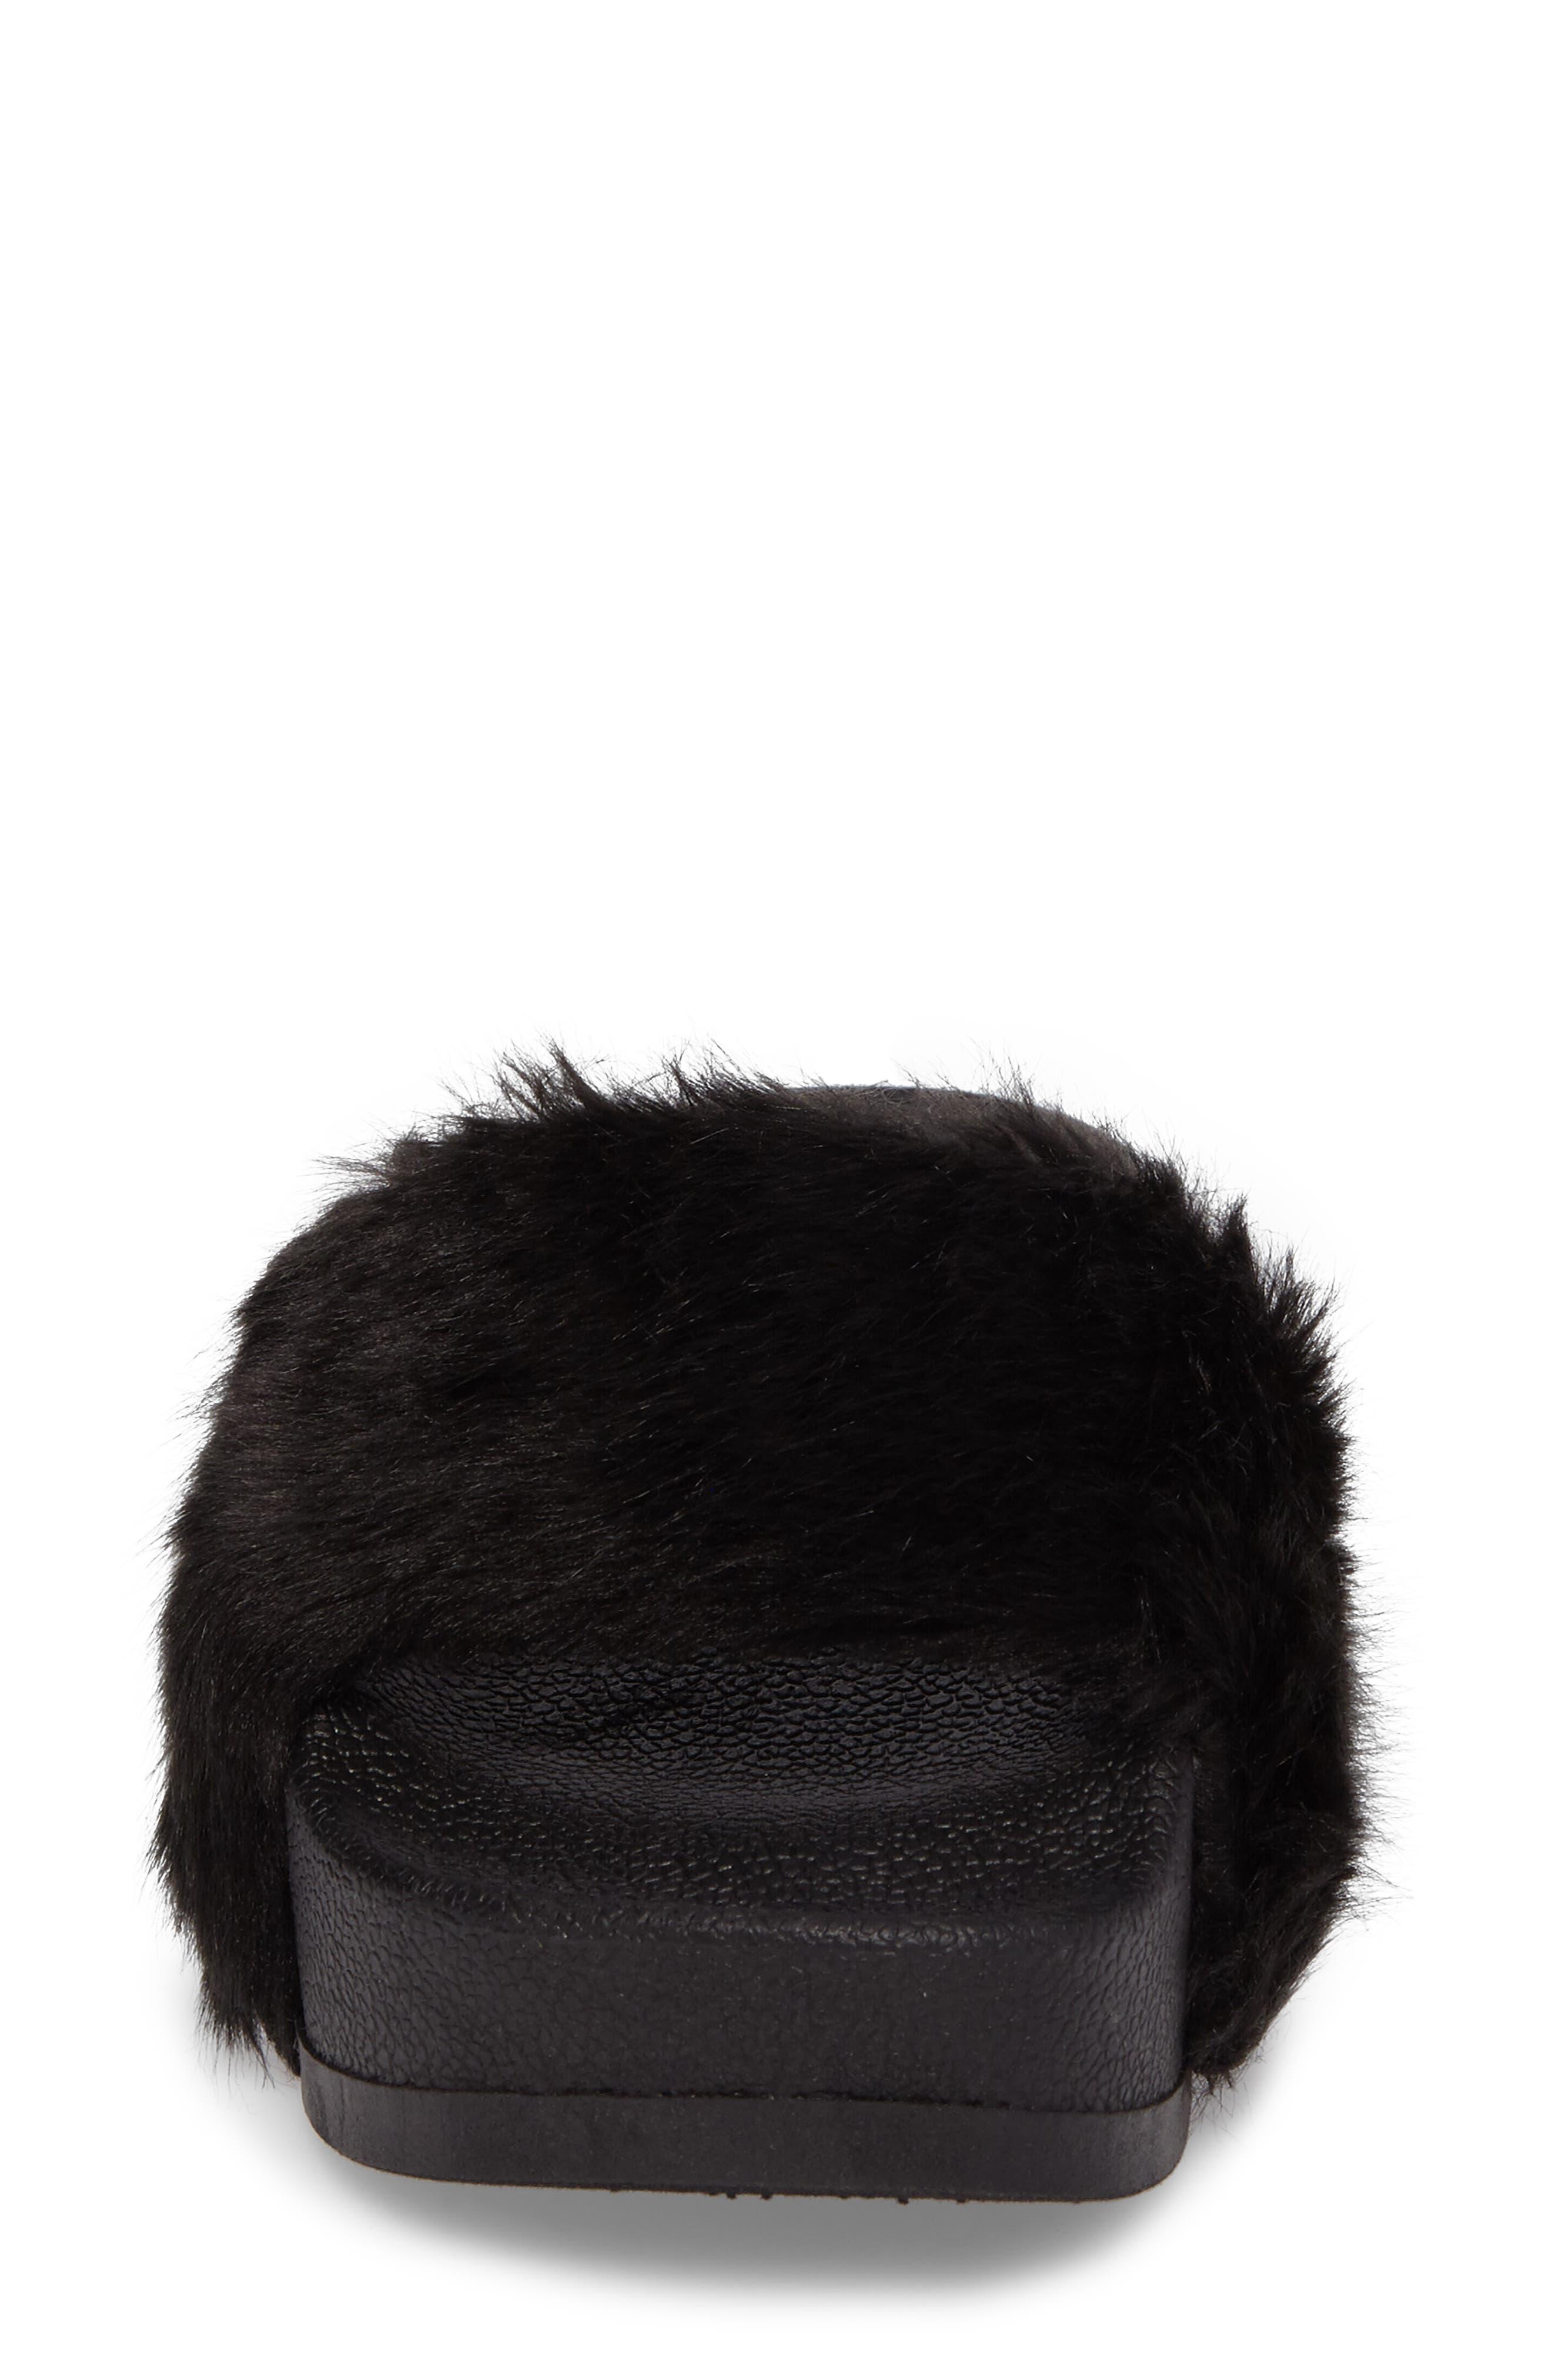 Softey Faux Fur Platform Slide,                             Alternate thumbnail 4, color,                             001